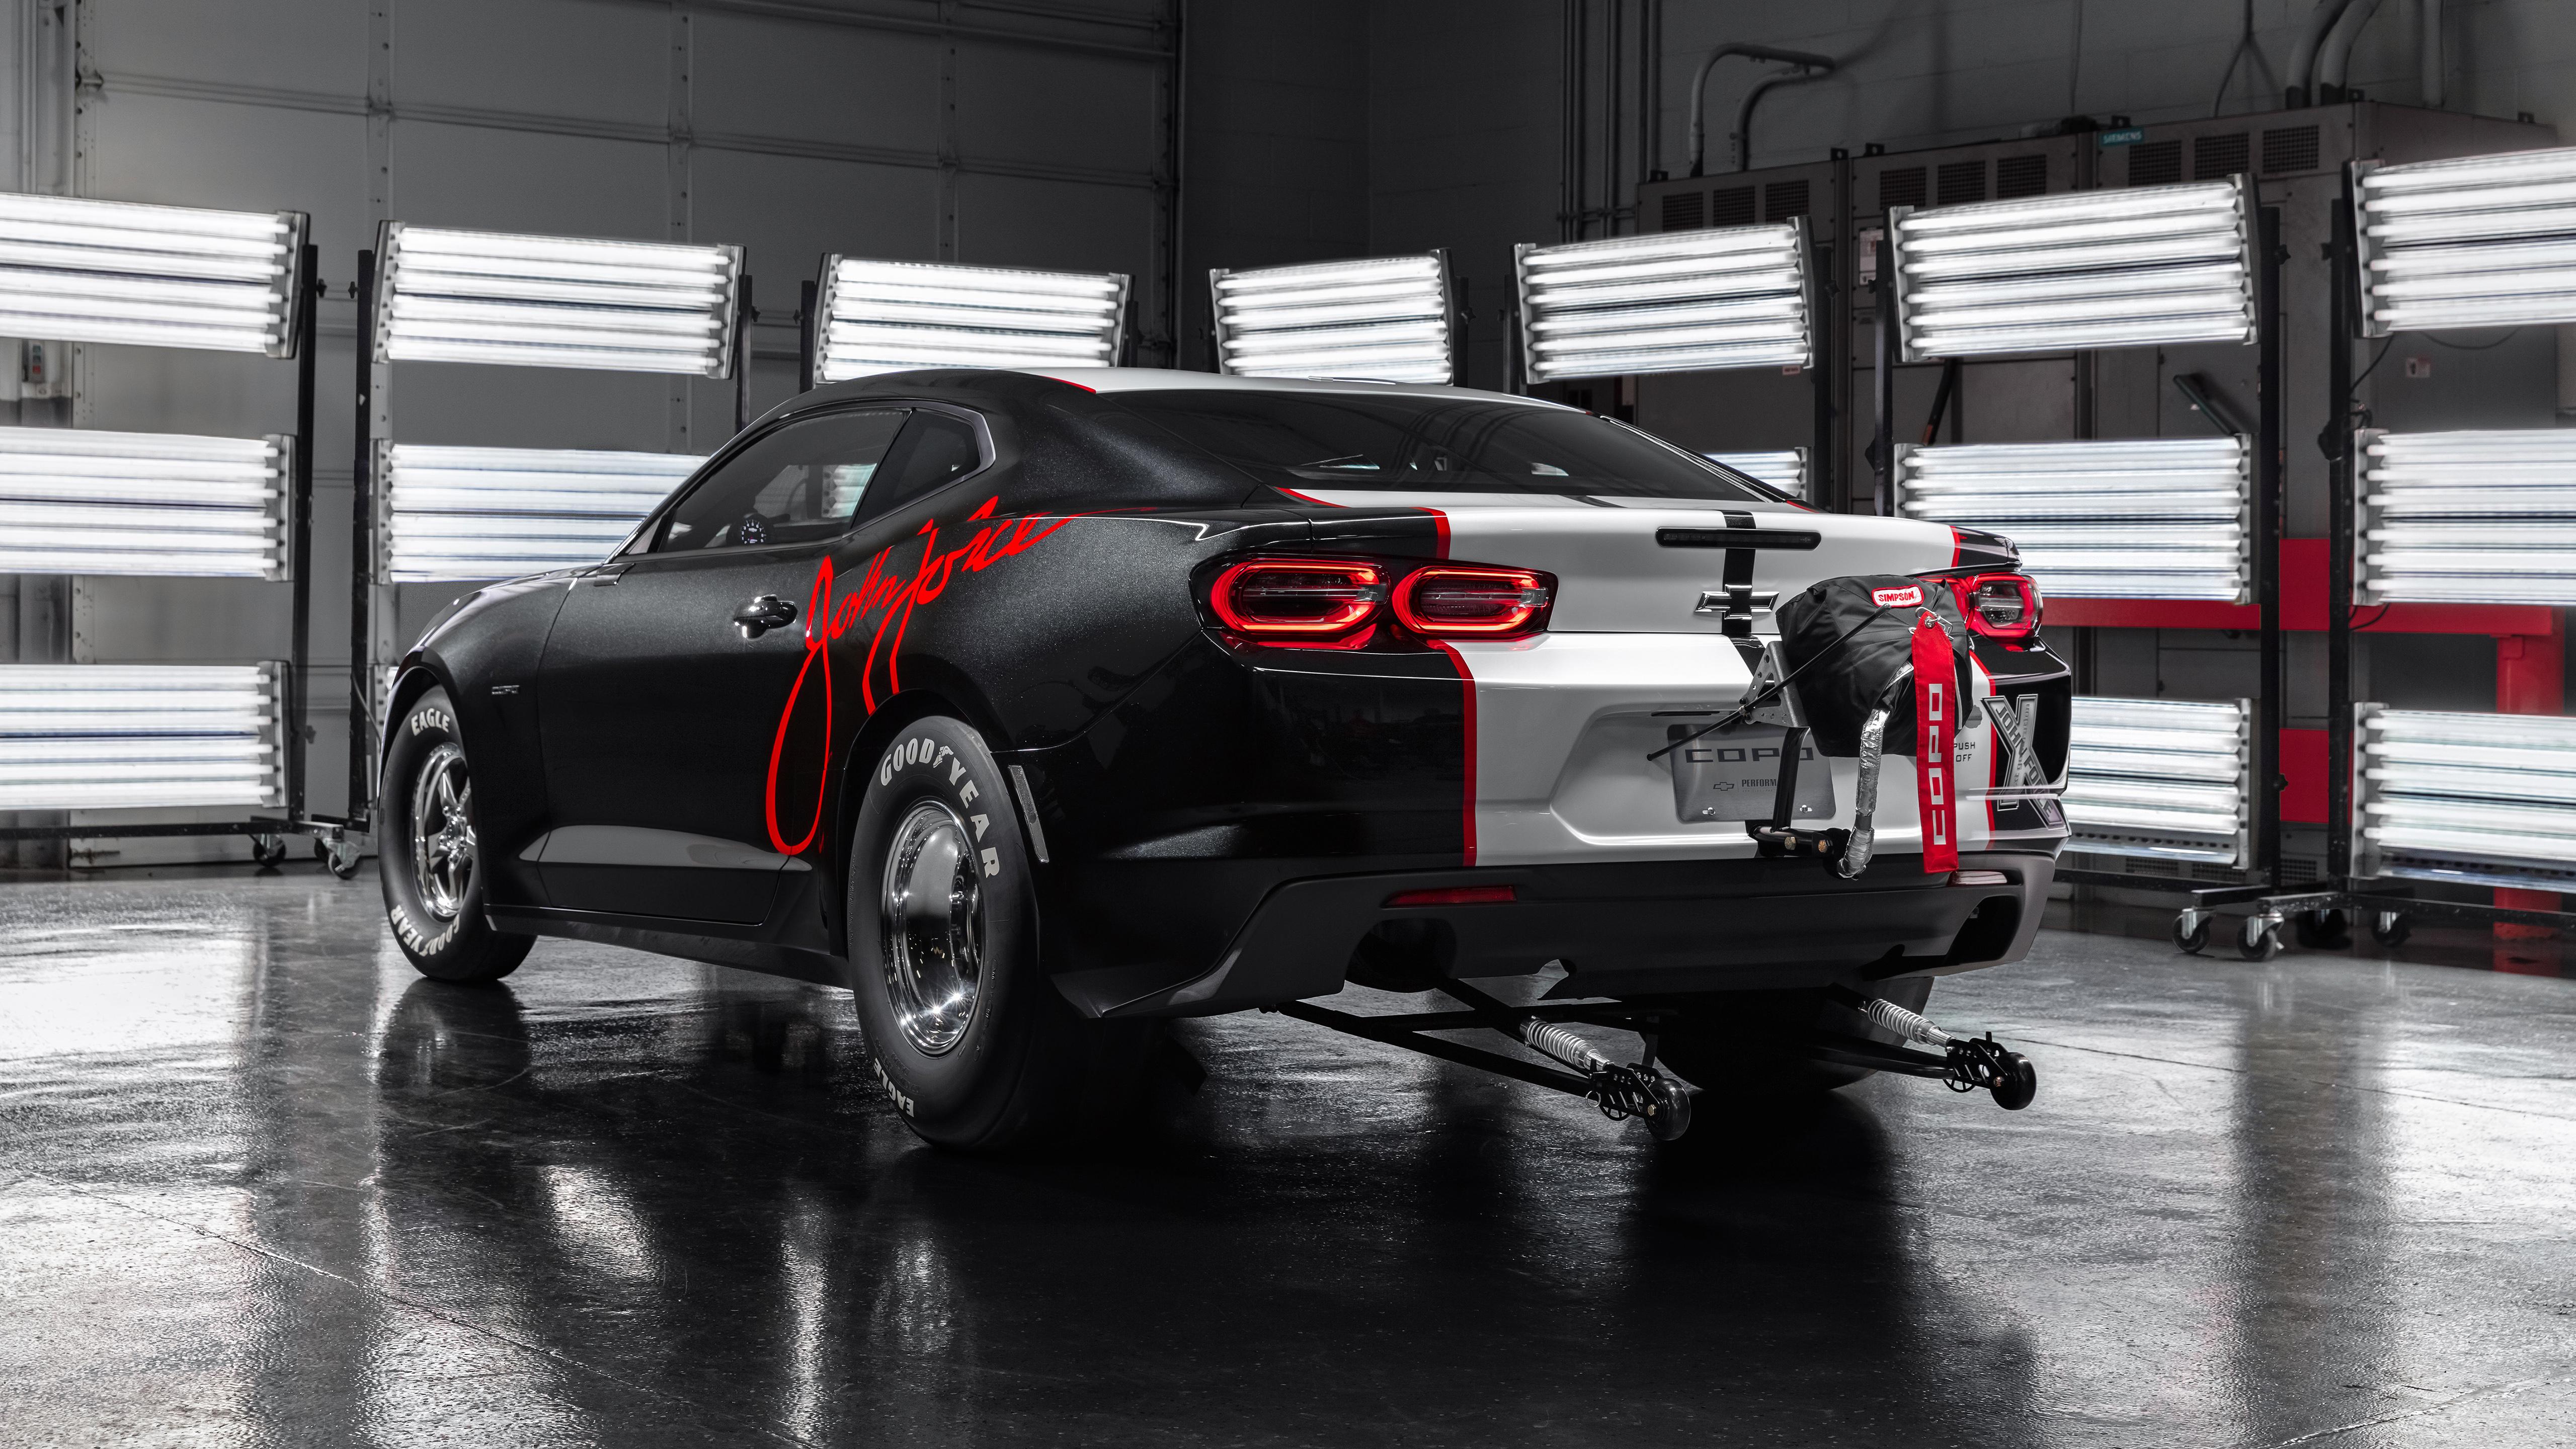 2020 Chevrolet COPO Camaro John Force Edition 4K 3 Wallpaper HD 5120x2880